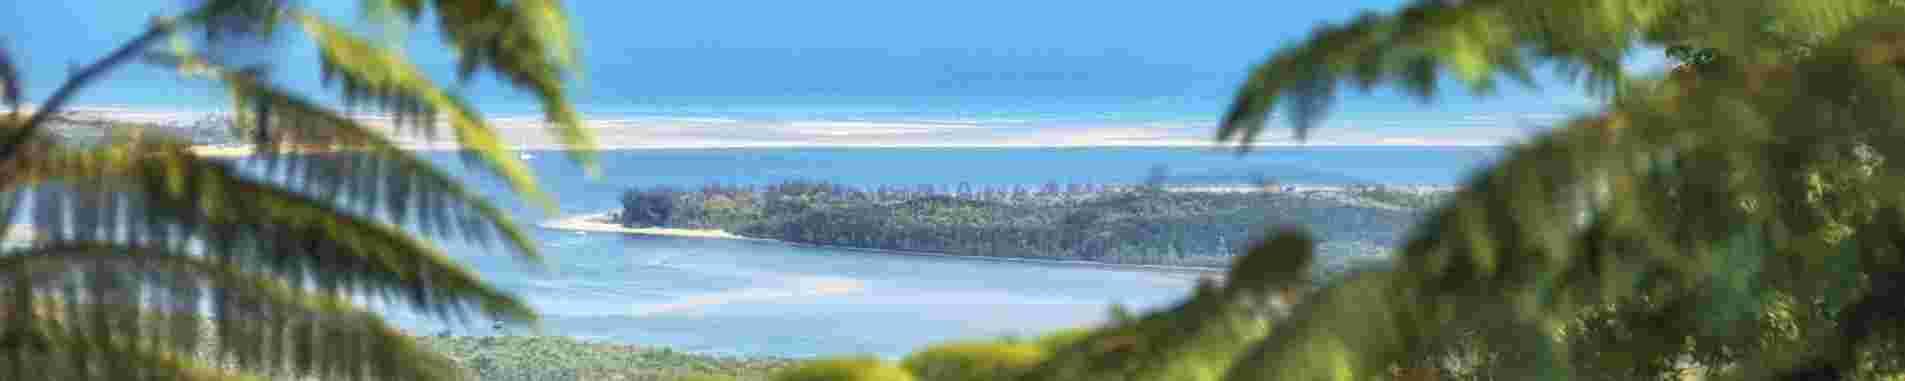 Far North Queensland, Daintree, Port Douglas header image